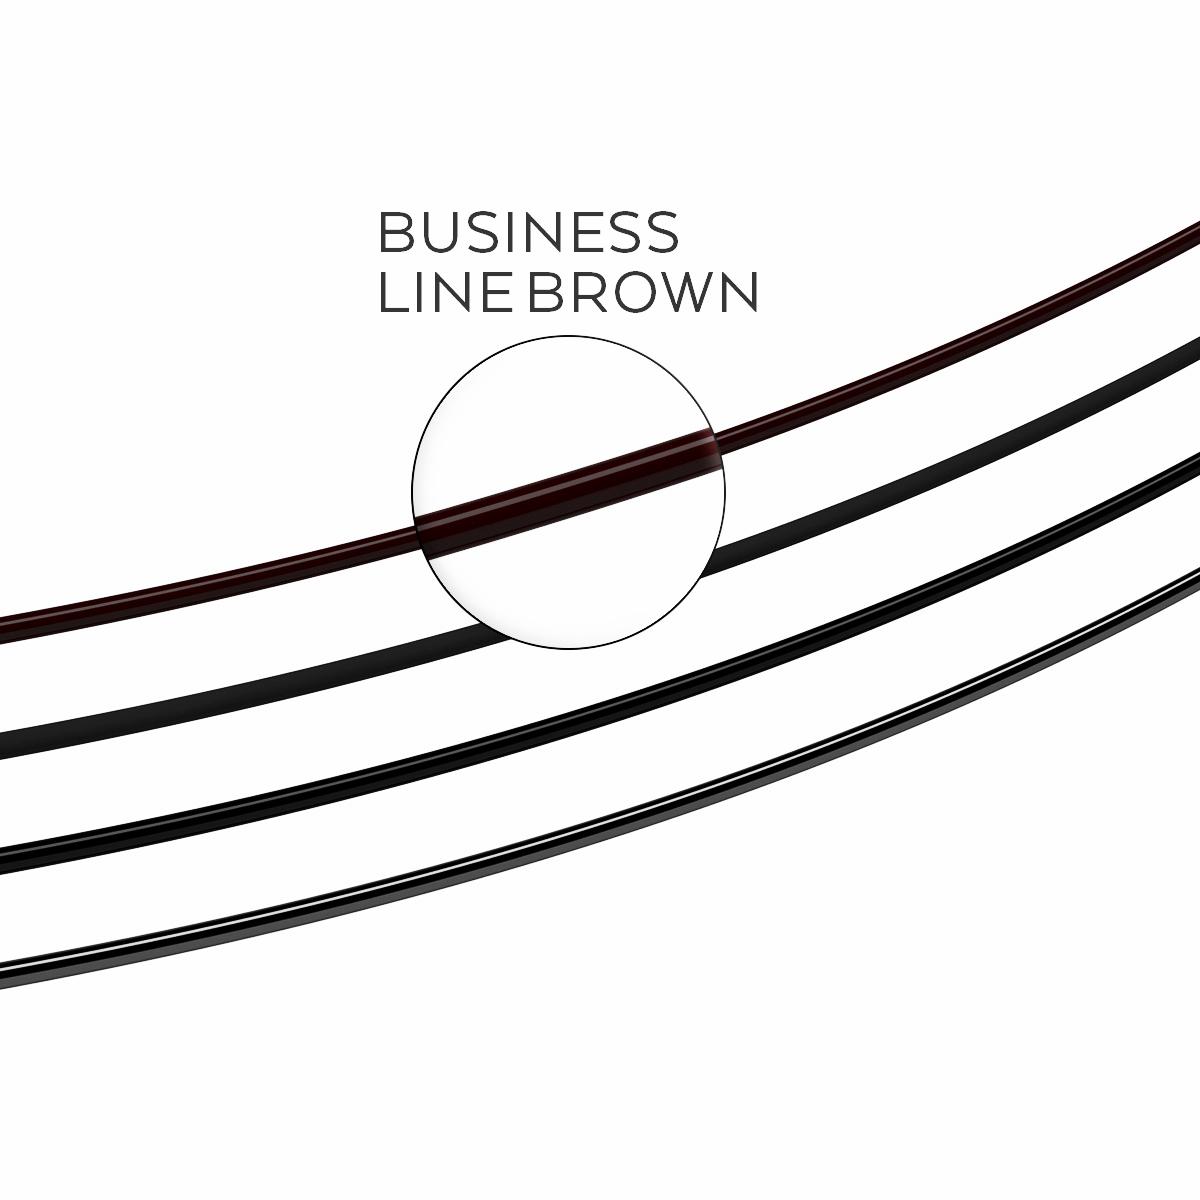 business-line-brown-c-0-07